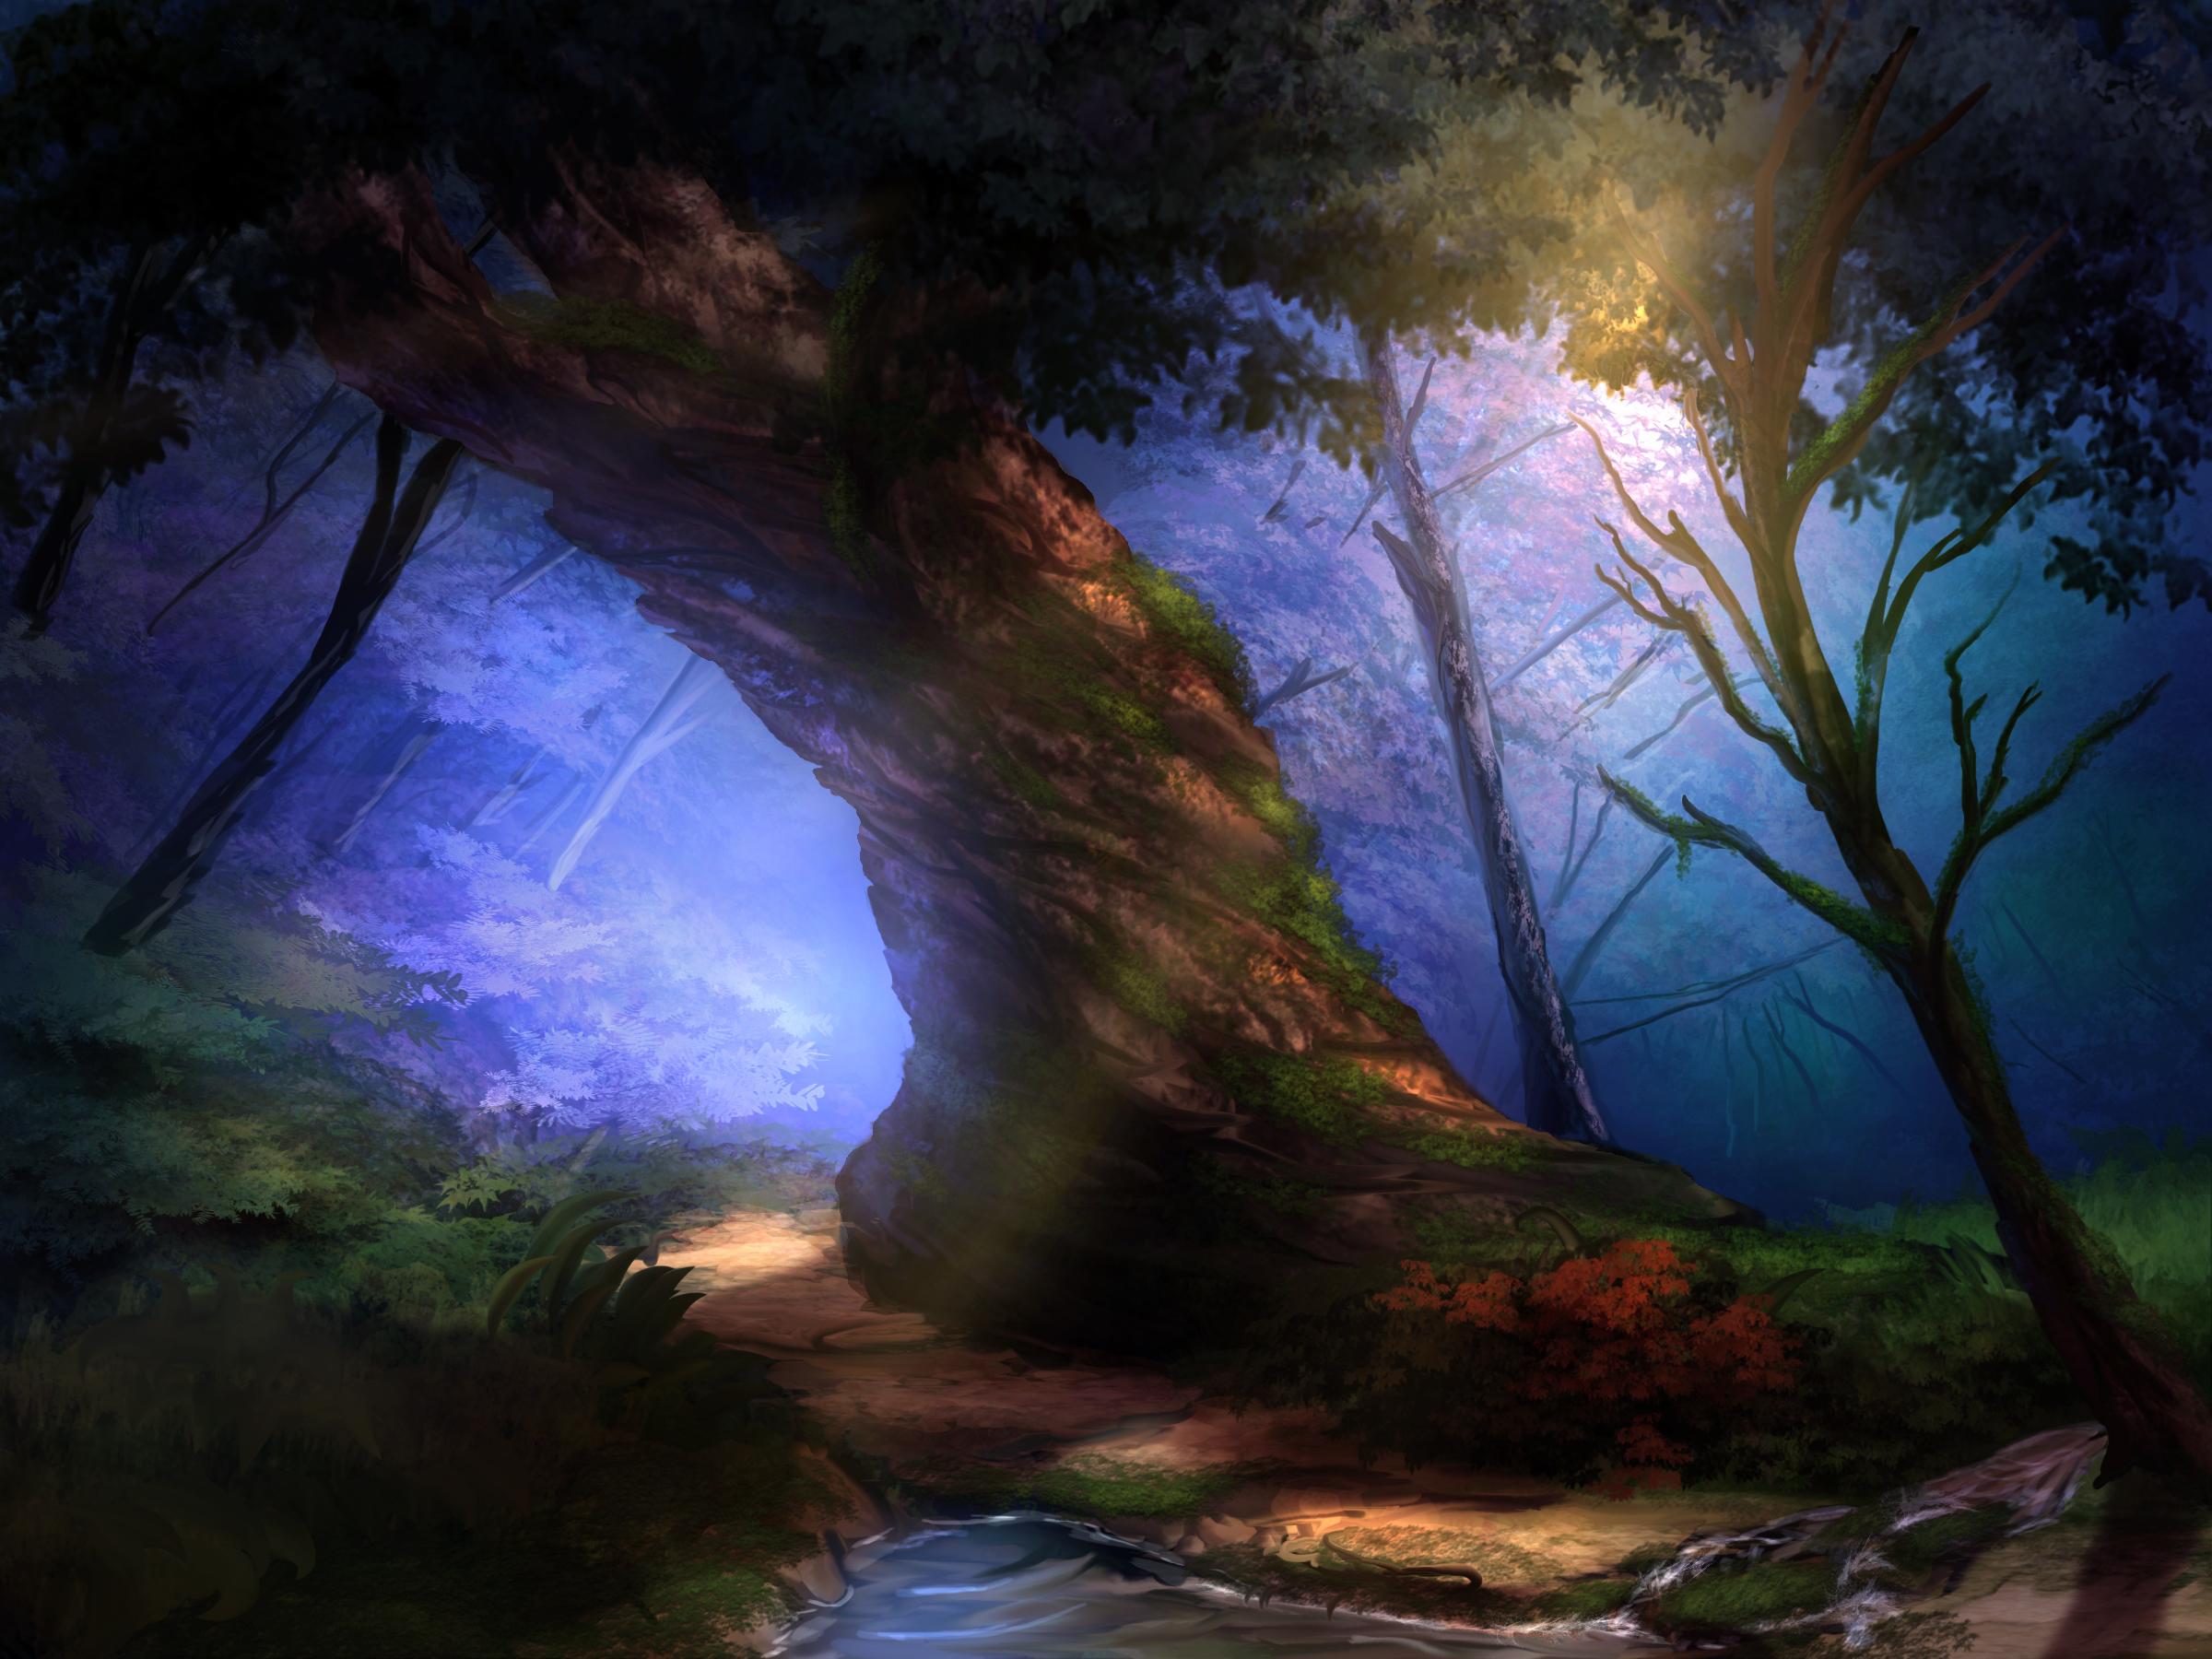 s1e21 - Beauty Is Everywhere, The Old Oak Tree